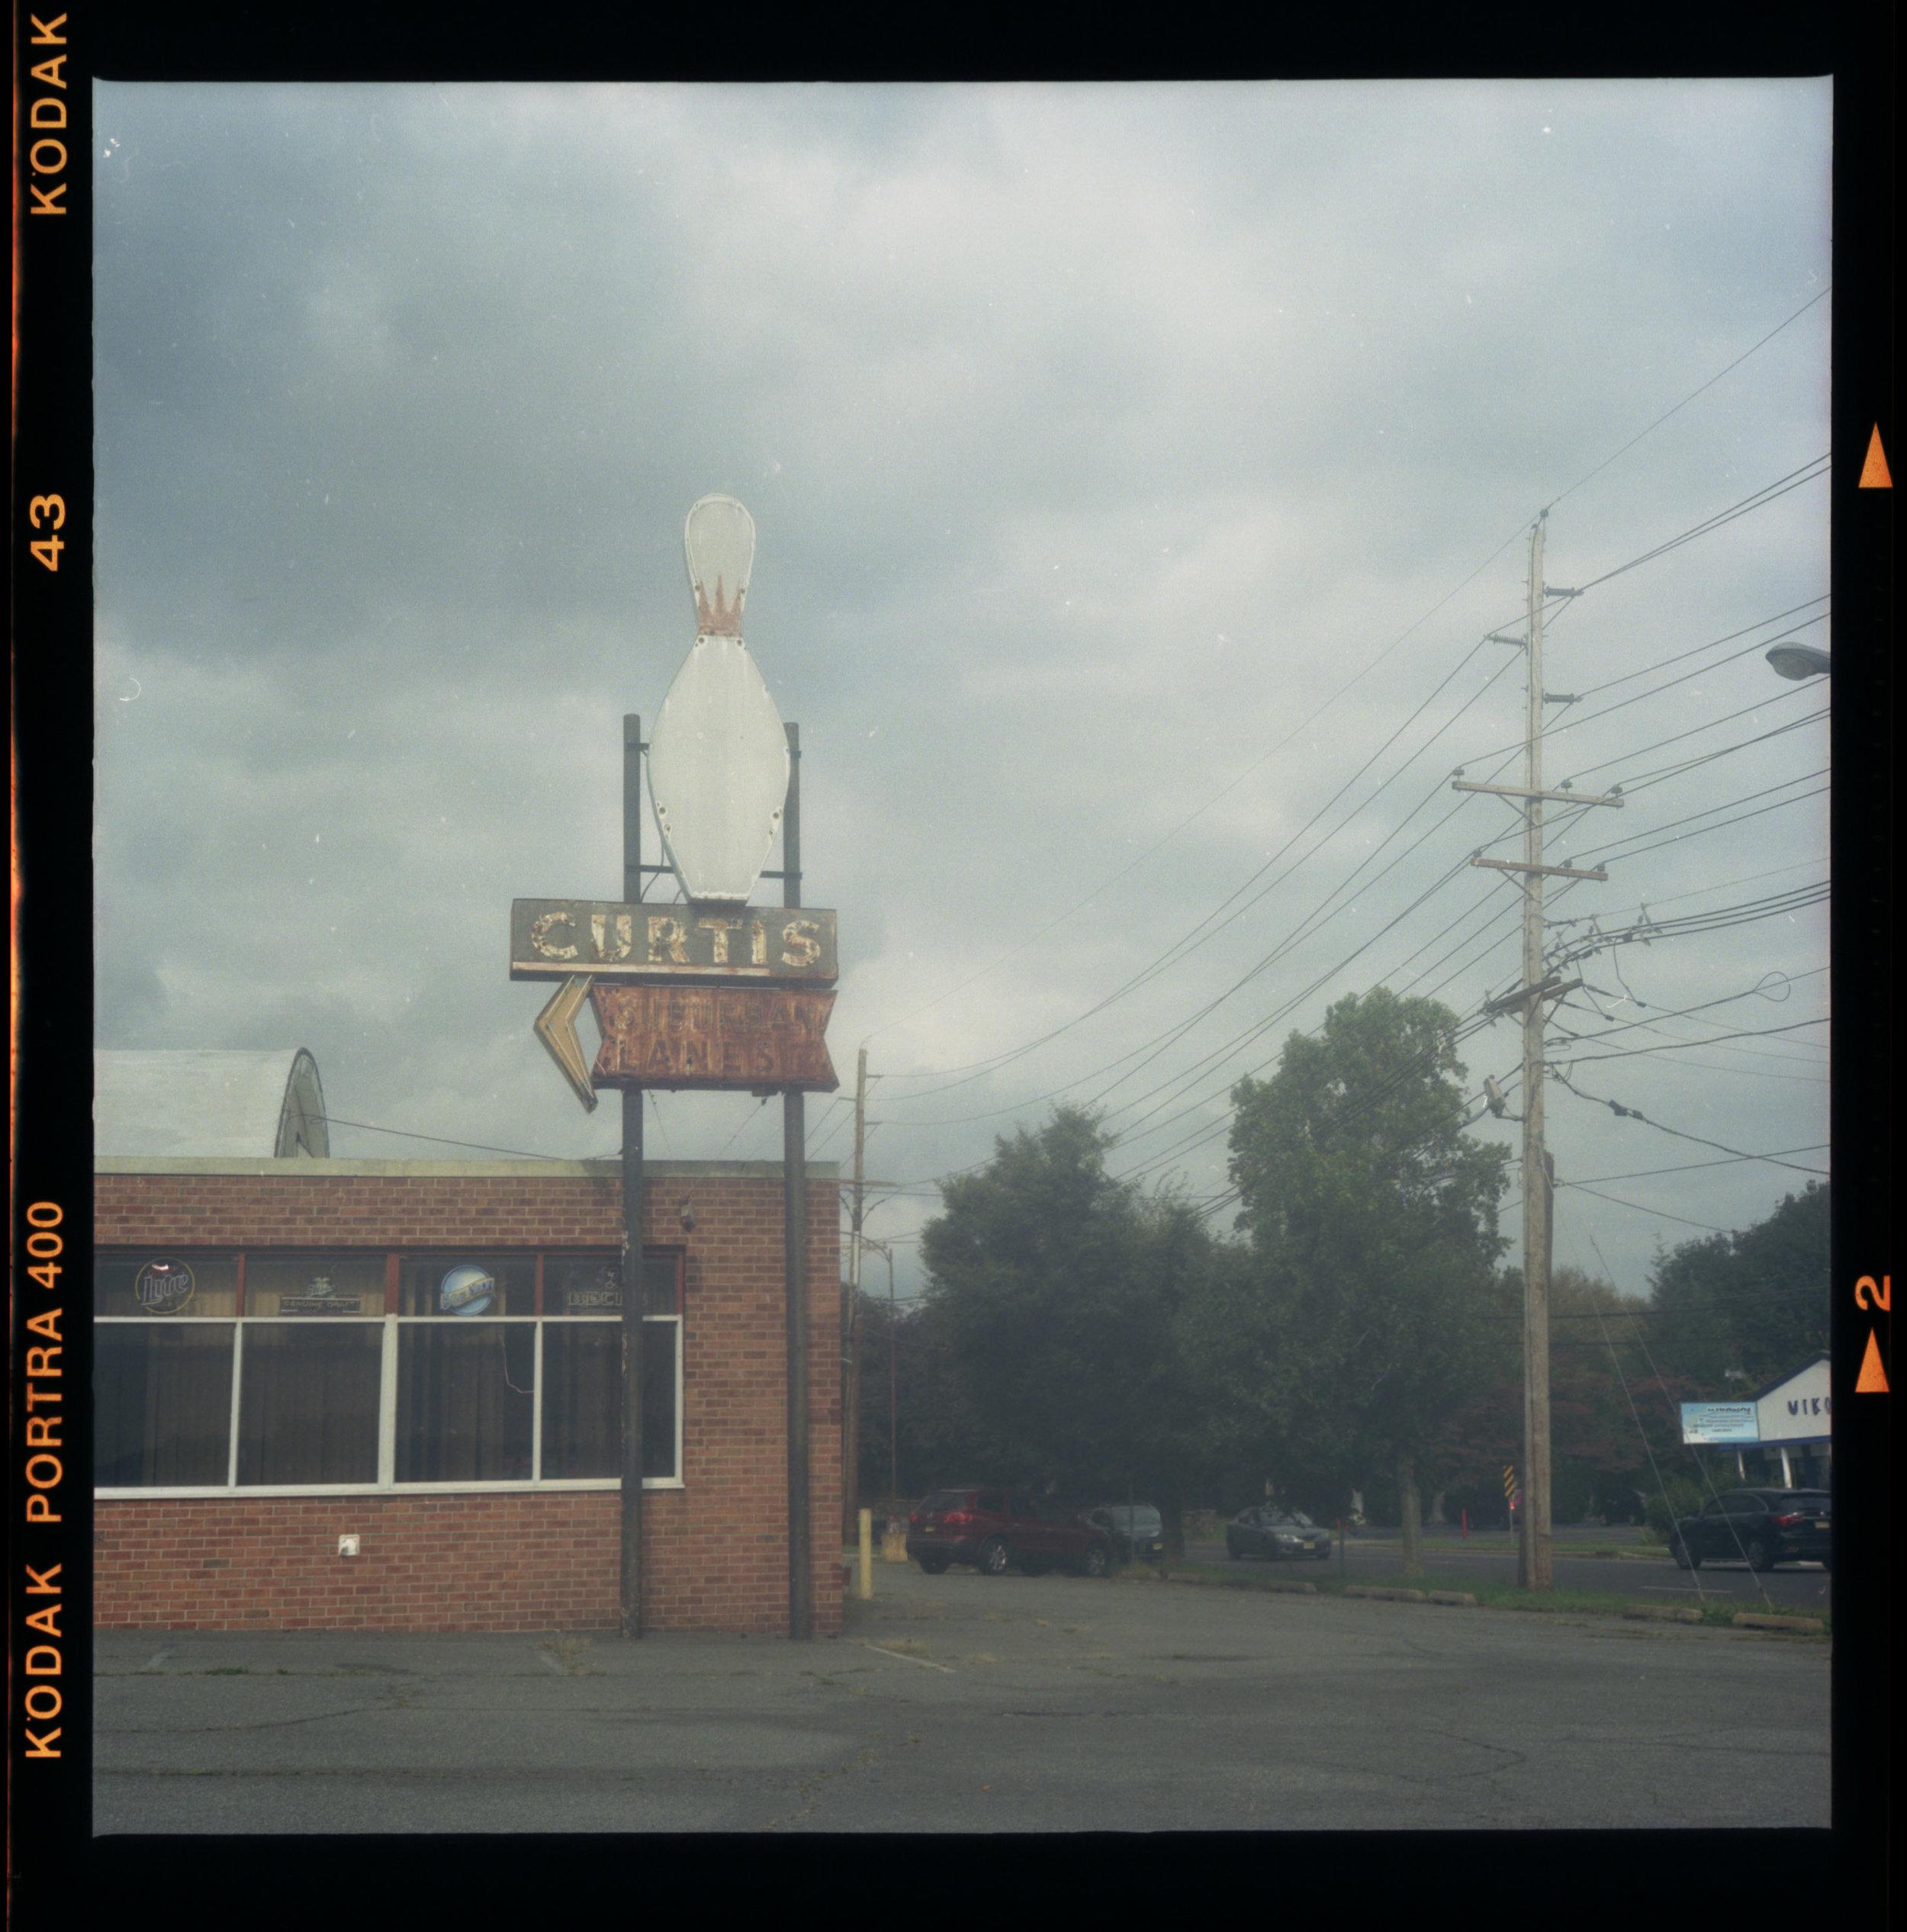 Curtis Bowling, Ewing, NJ